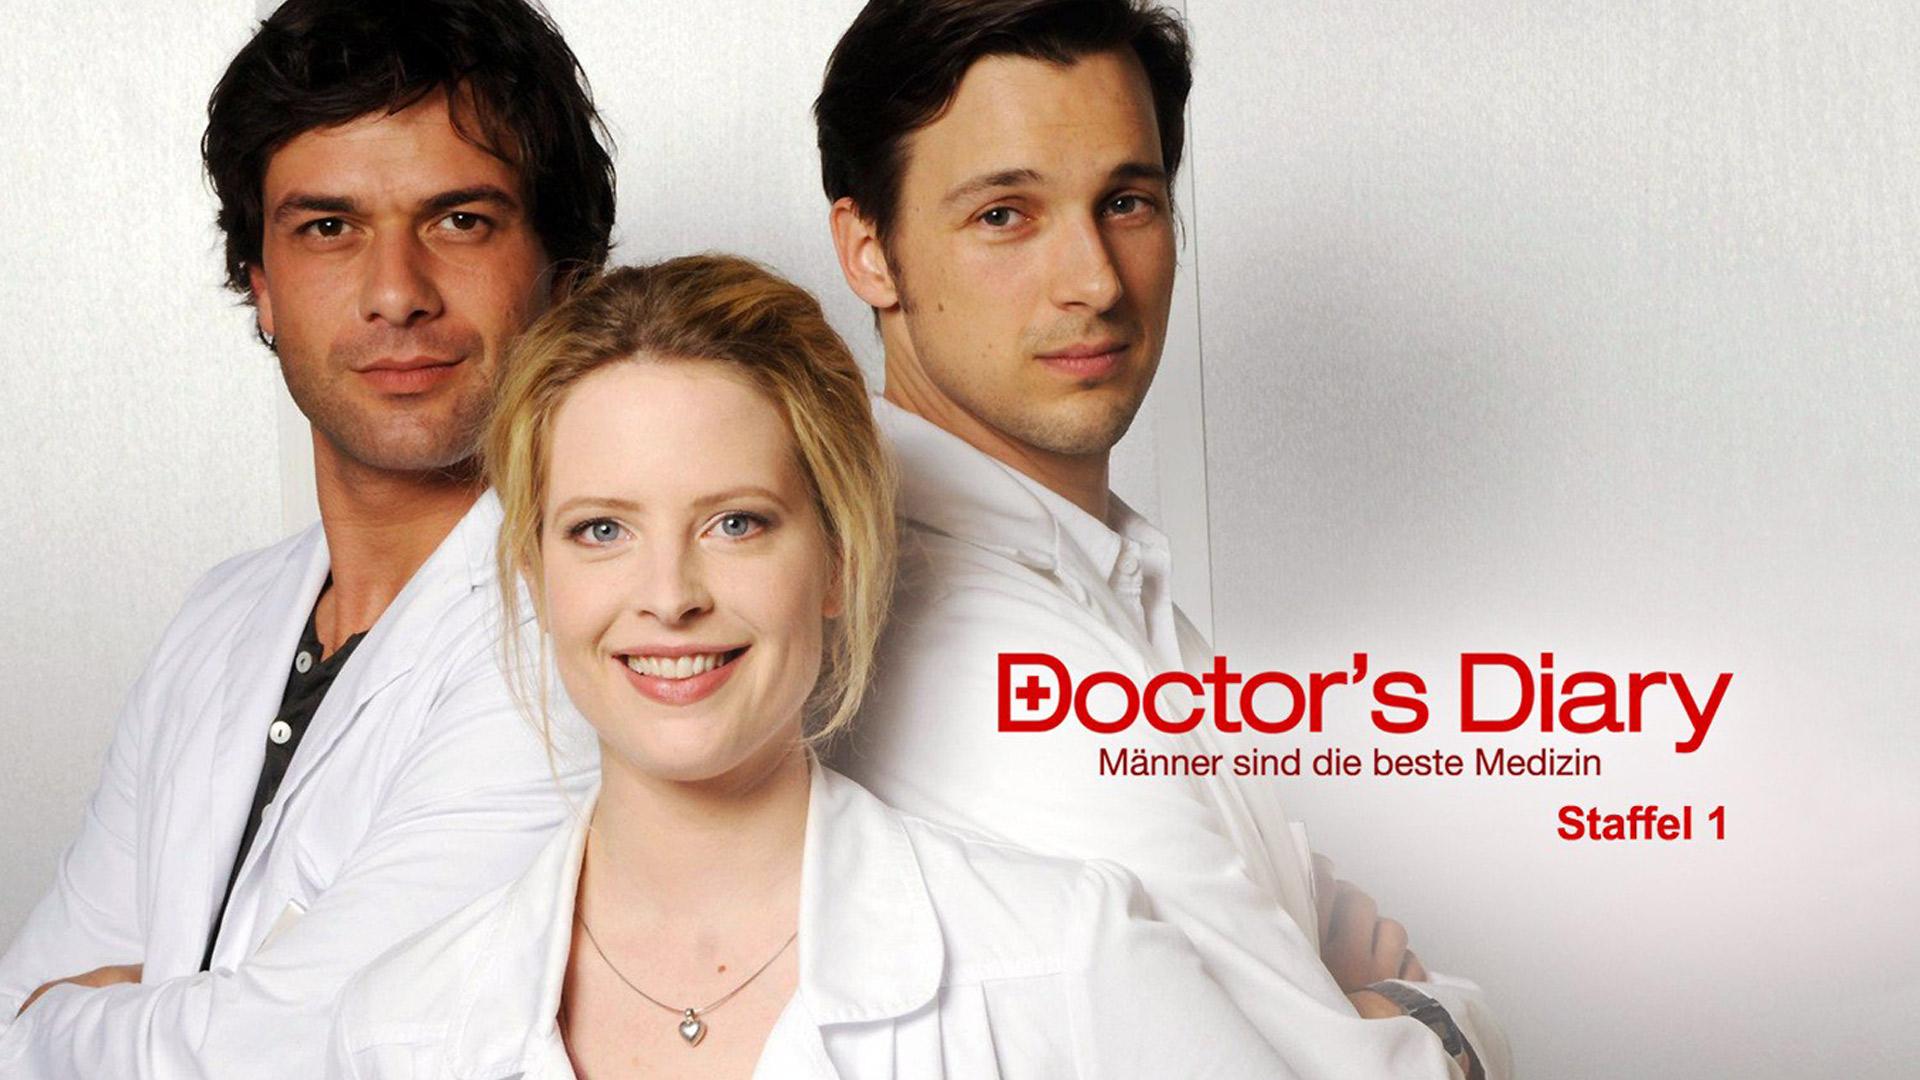 Doctors Diary - Staffel 1